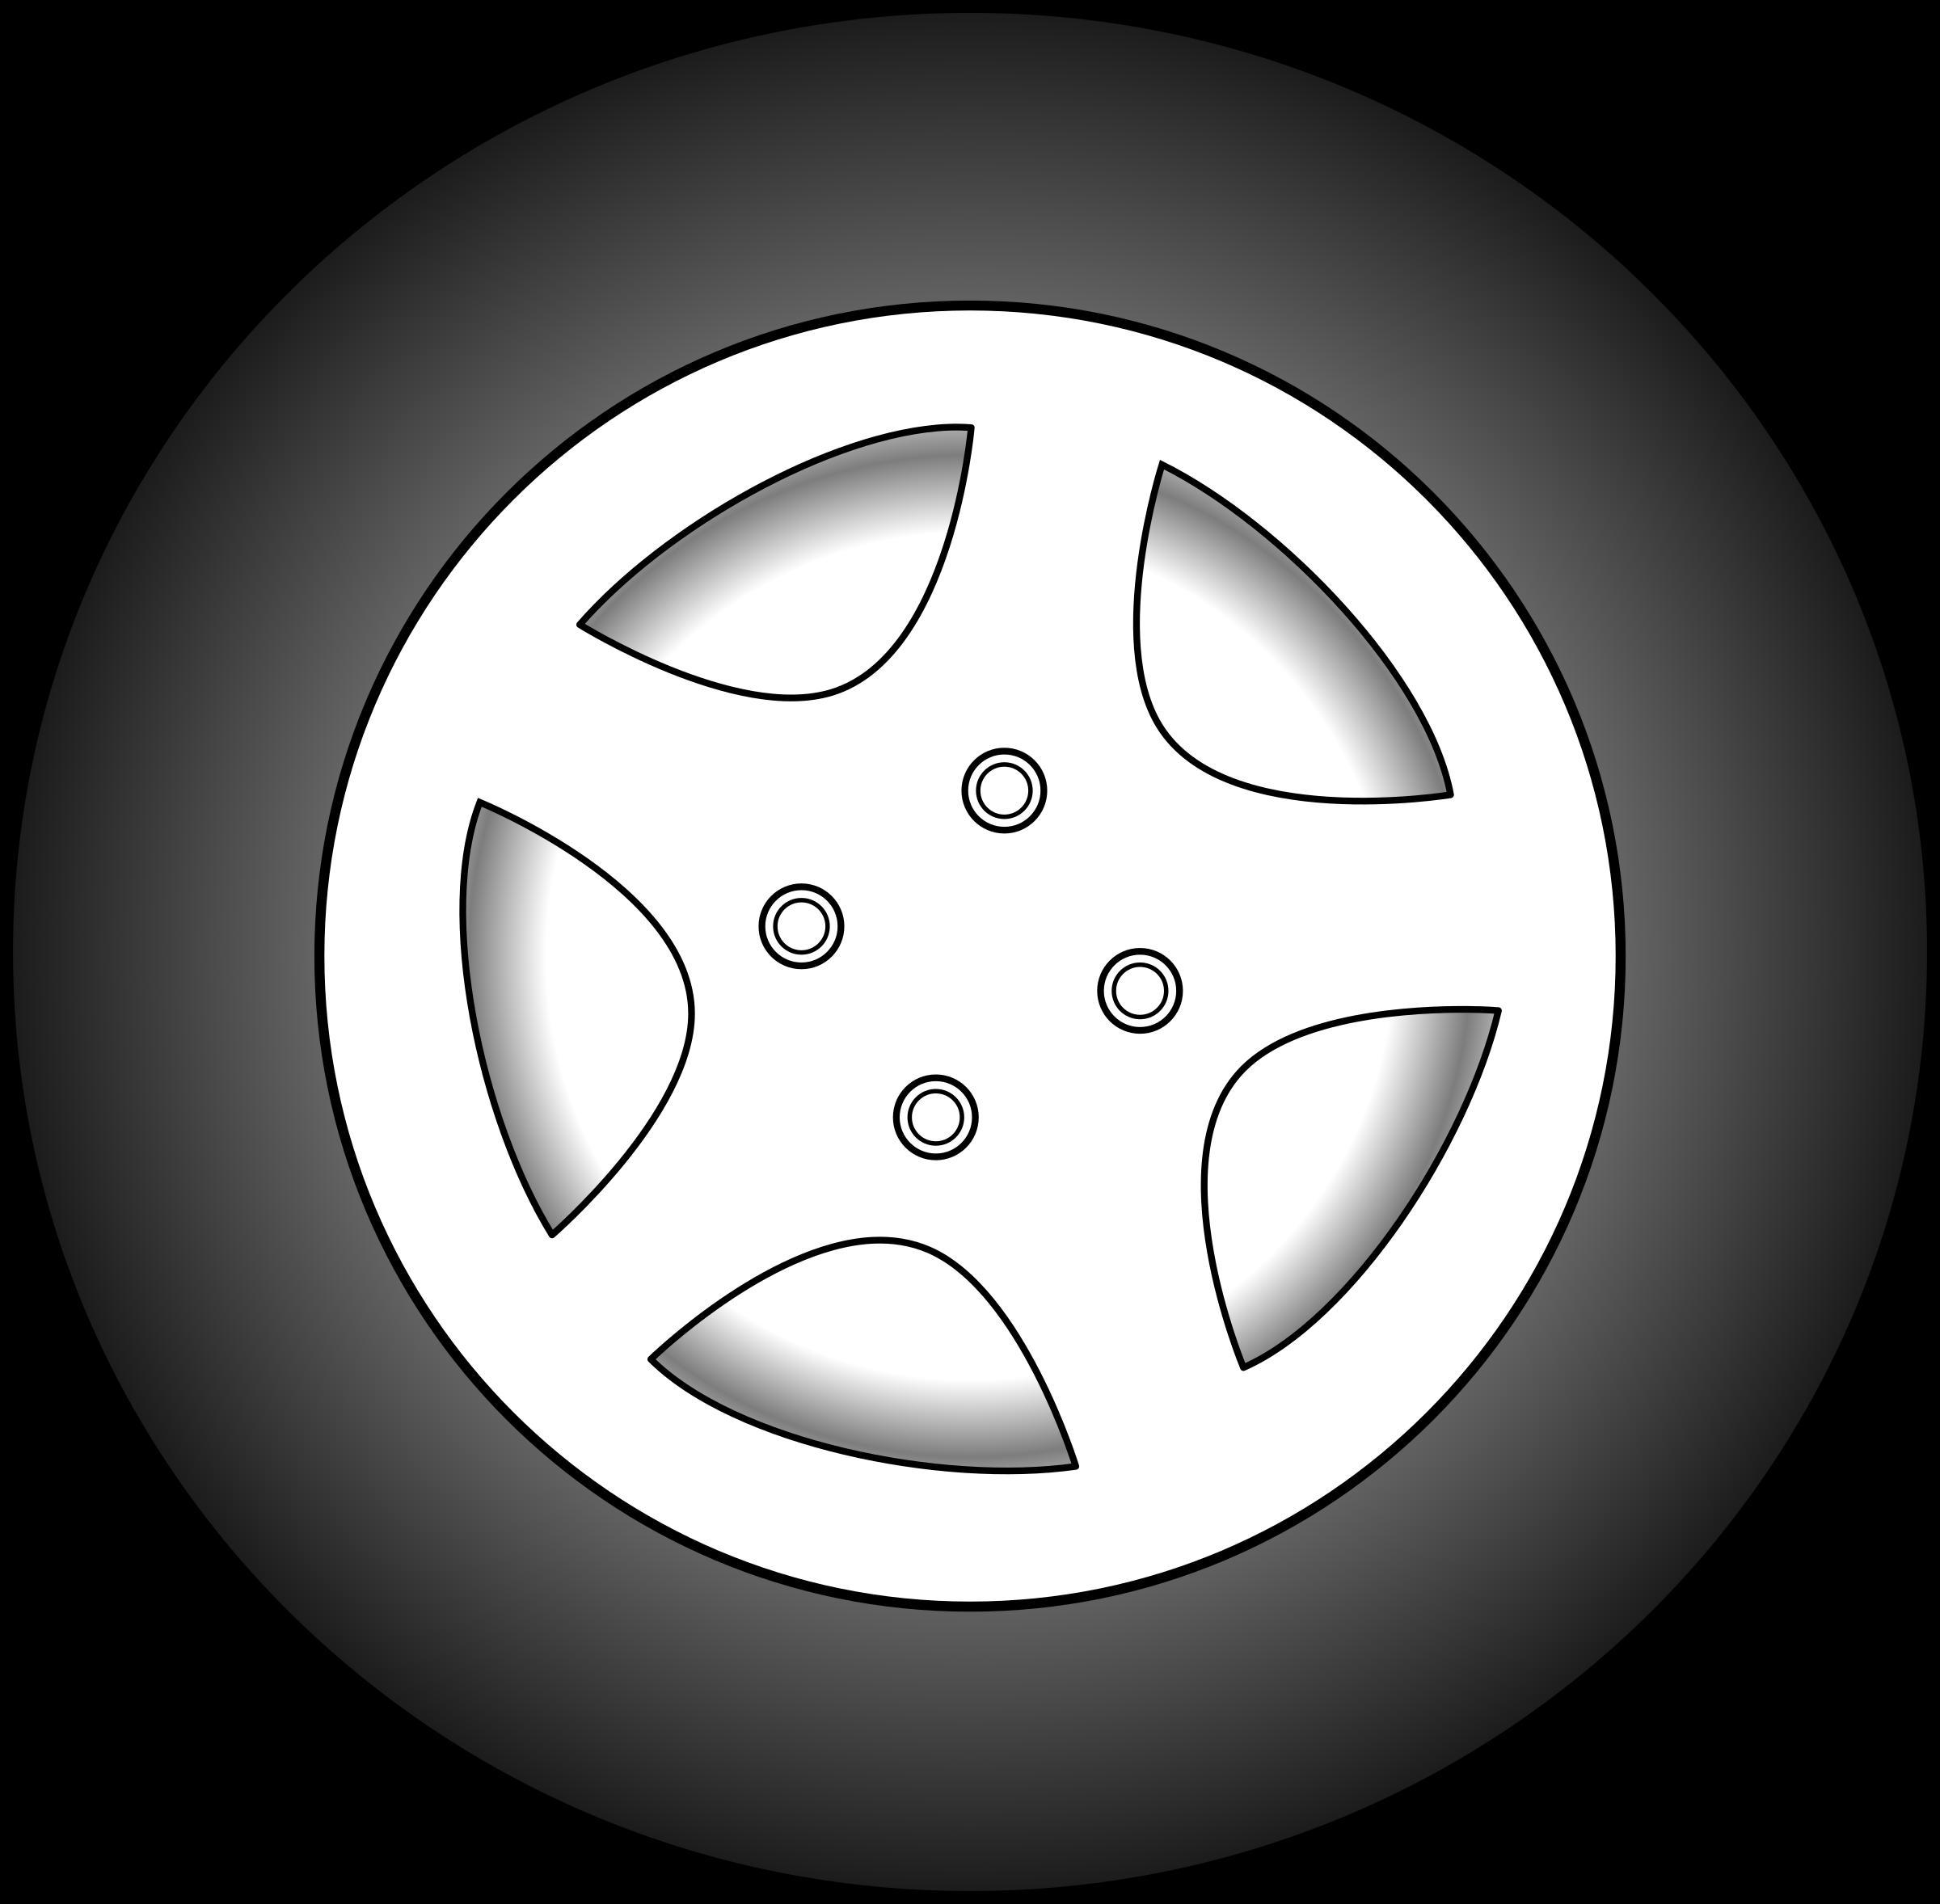 svg freeuse stock Wheels clipart. Wheel